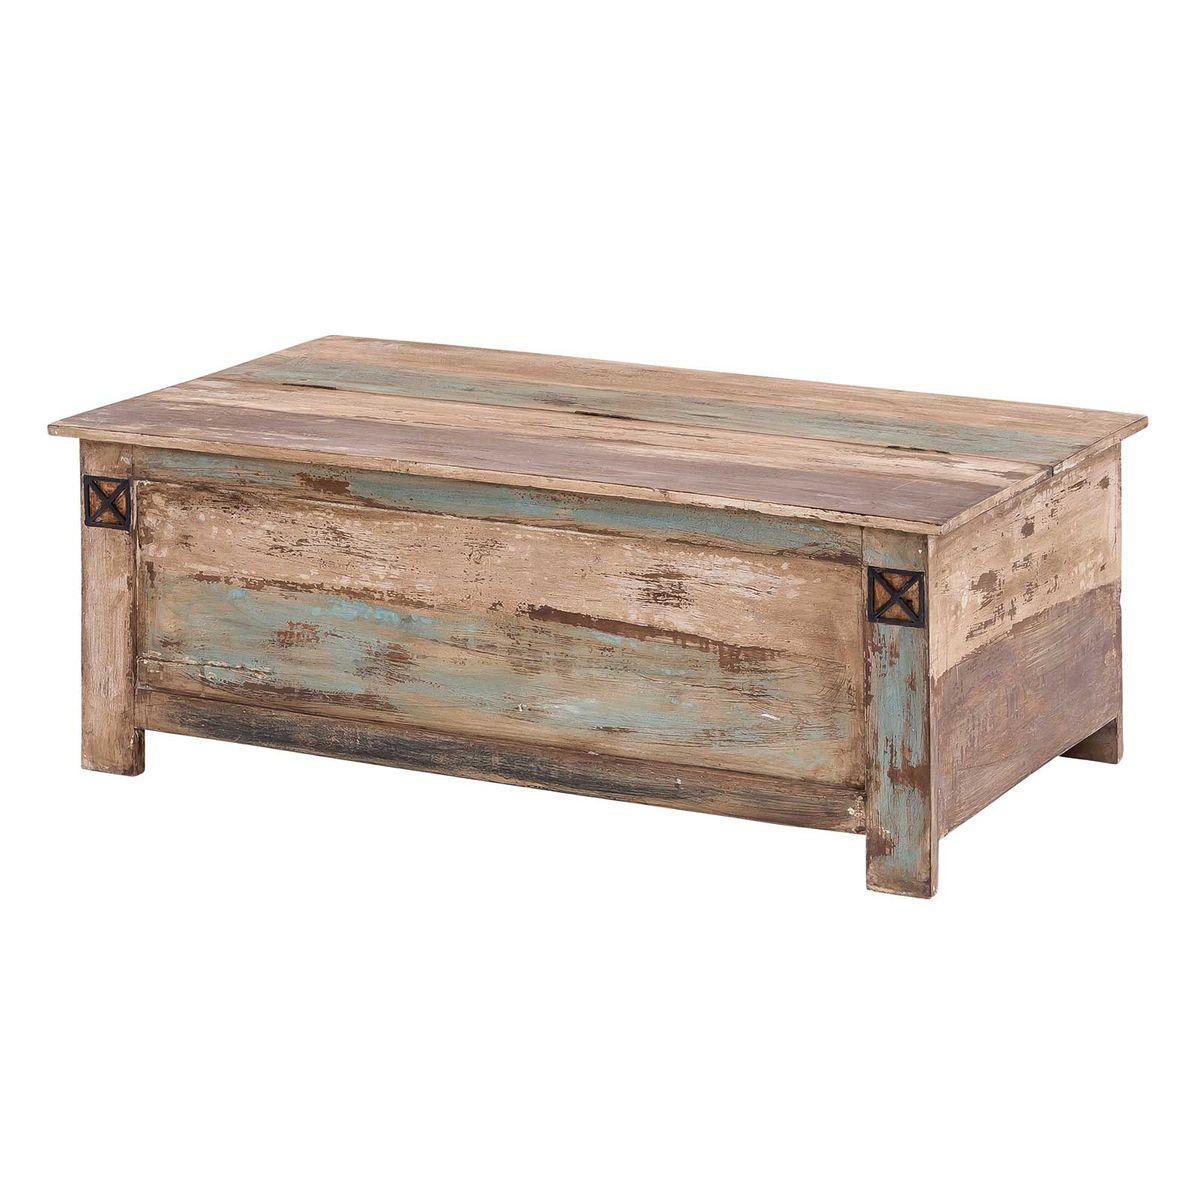 couchtisch truhe massivholz largo 115 x 67 cm aus. Black Bedroom Furniture Sets. Home Design Ideas